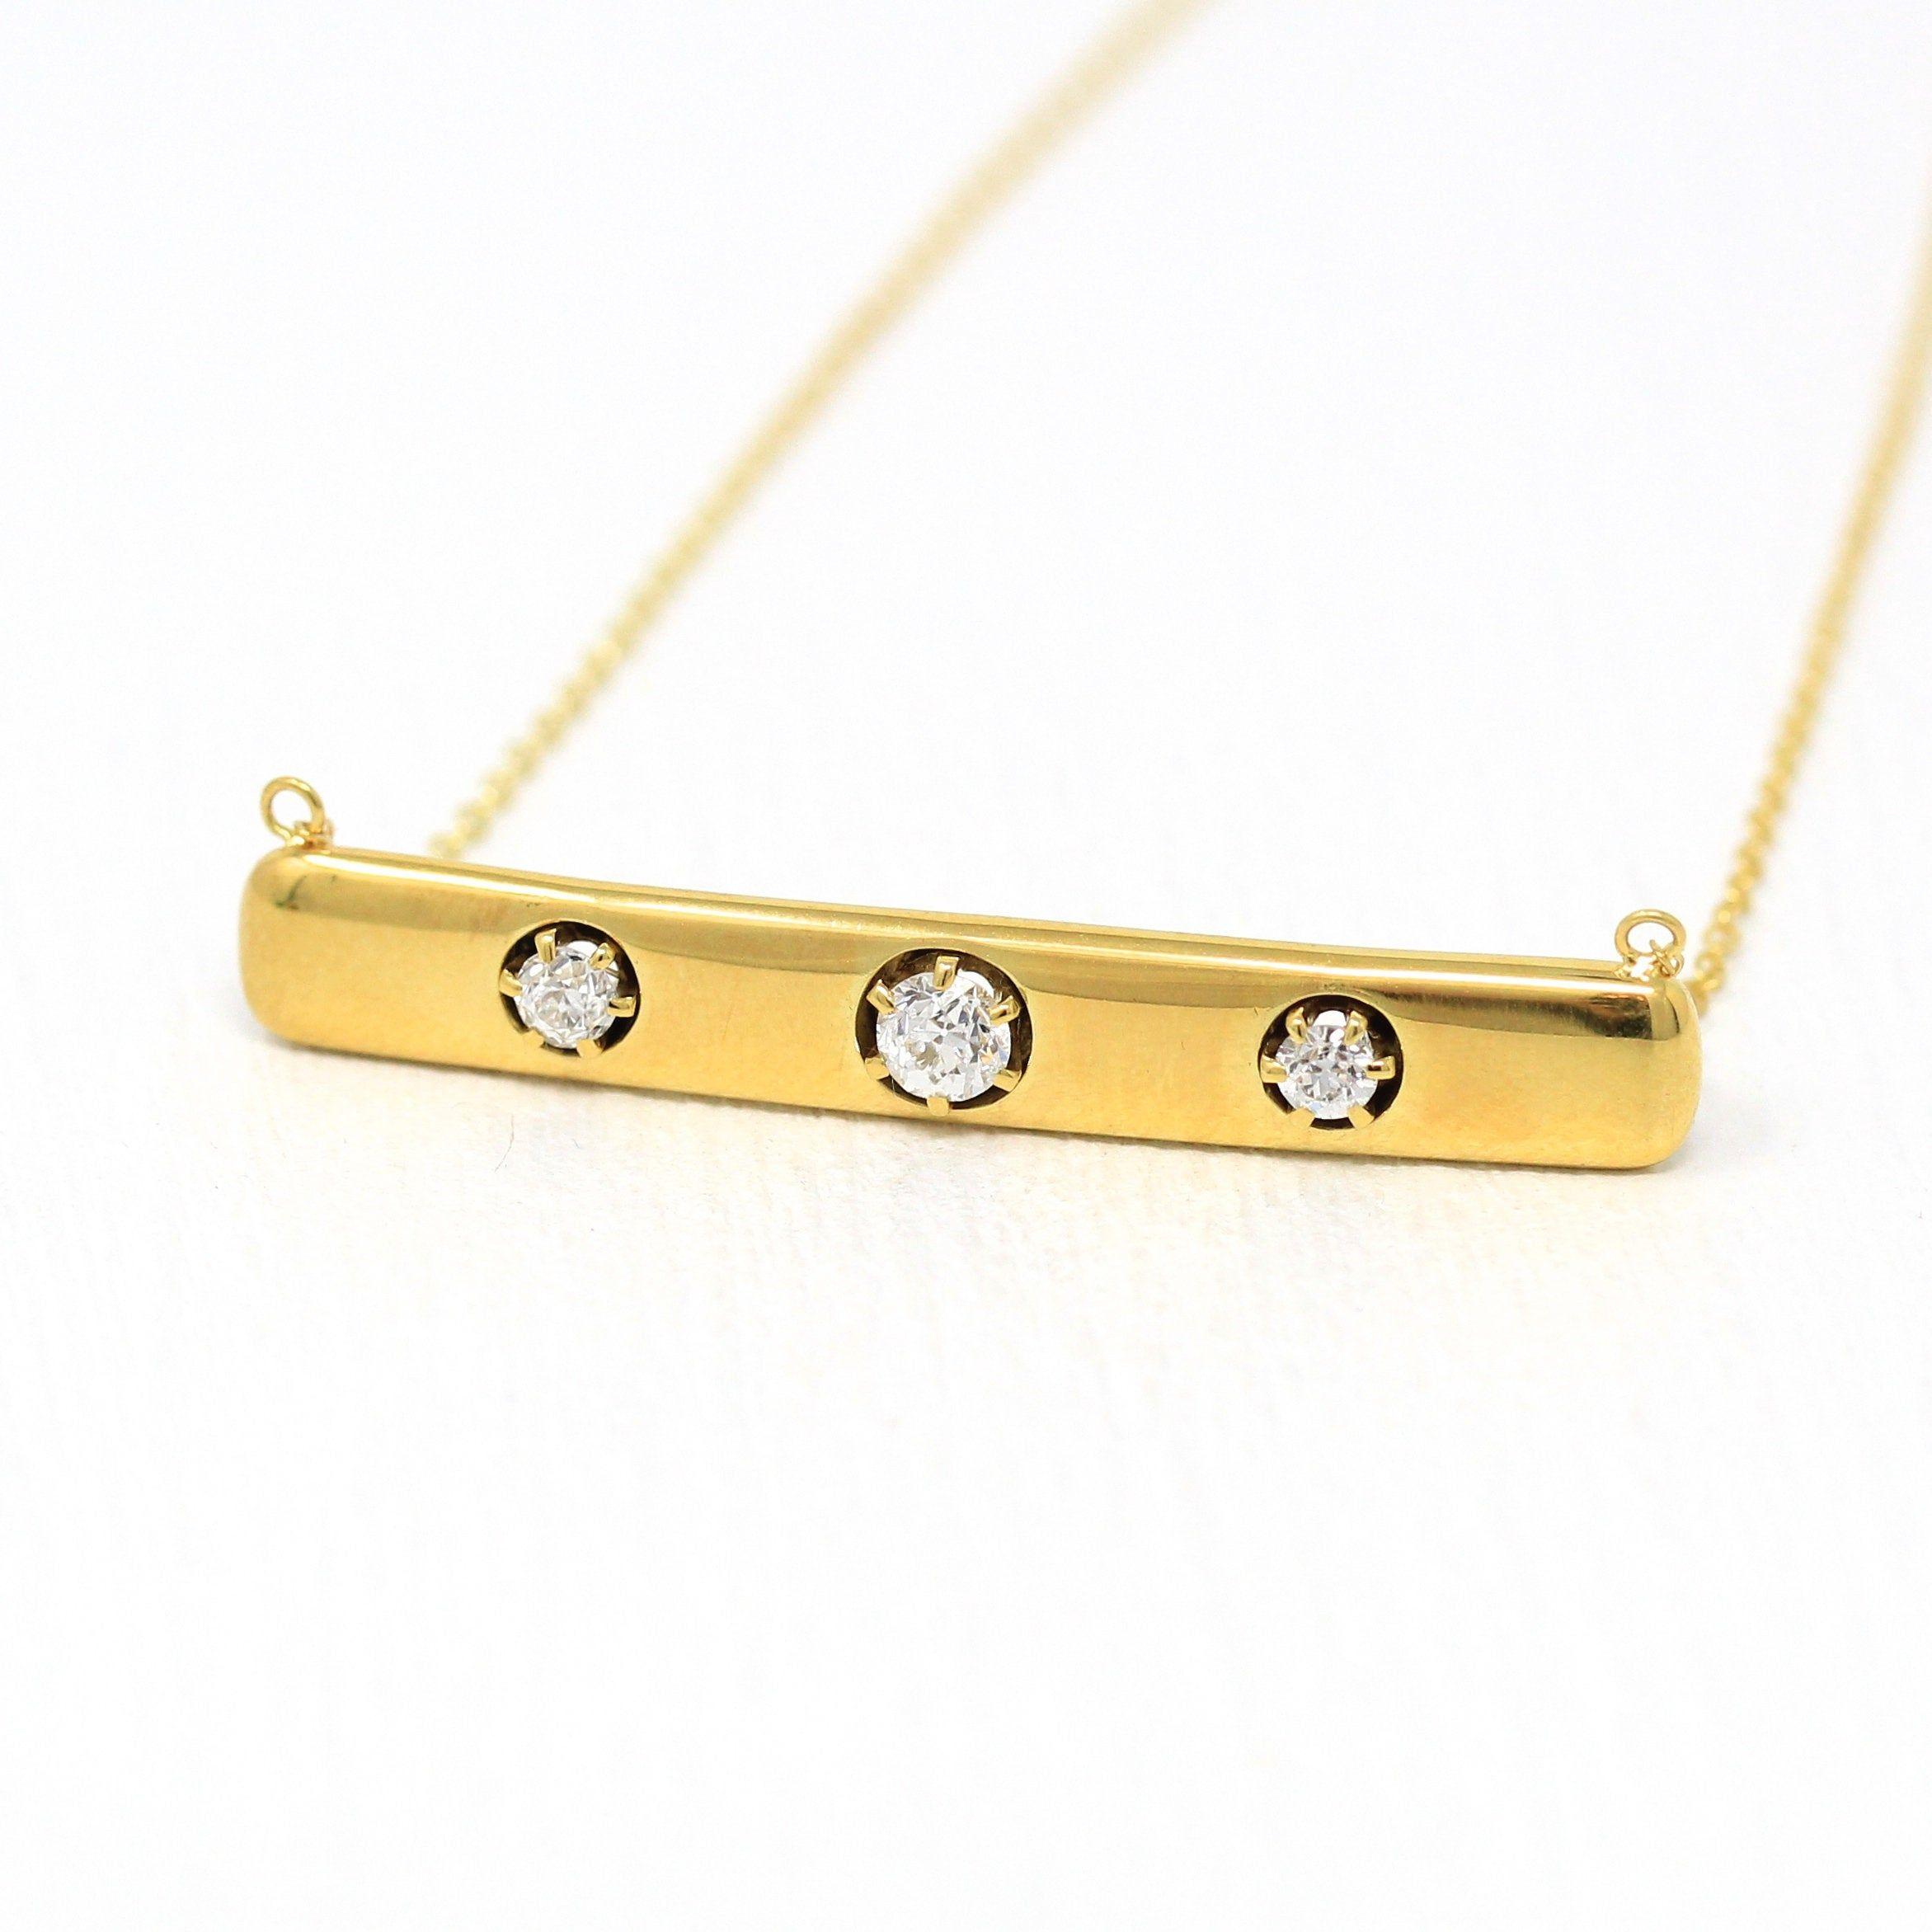 Diamond Bar Necklace Antique 14k Yellow Gold Brooch Etsy Diamond Bar Necklace Bar Necklace Yellow Gold Pendants